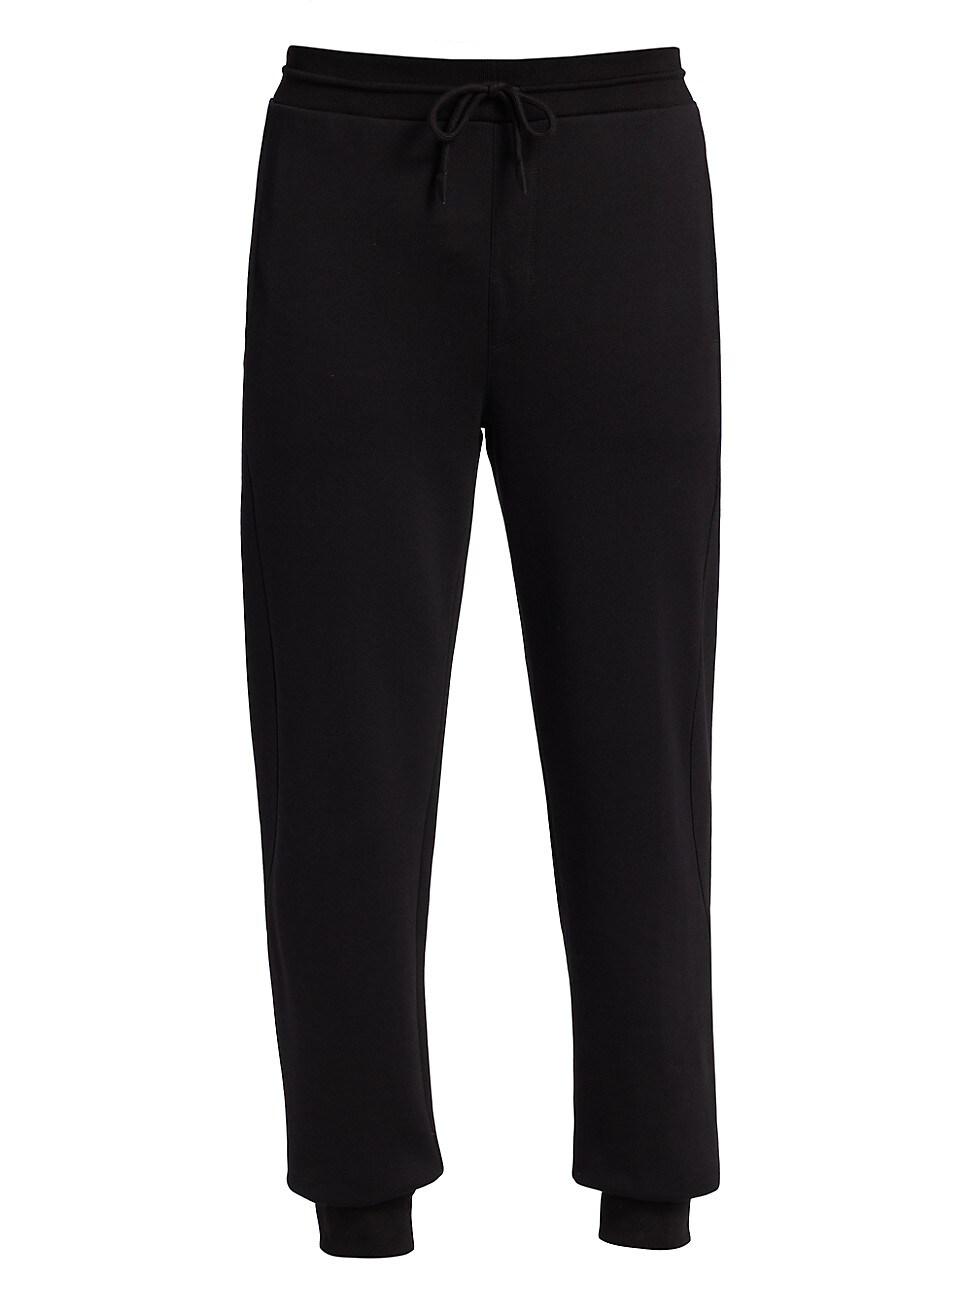 Ermenegildo Zegna Premium Cotton Joggers In Black